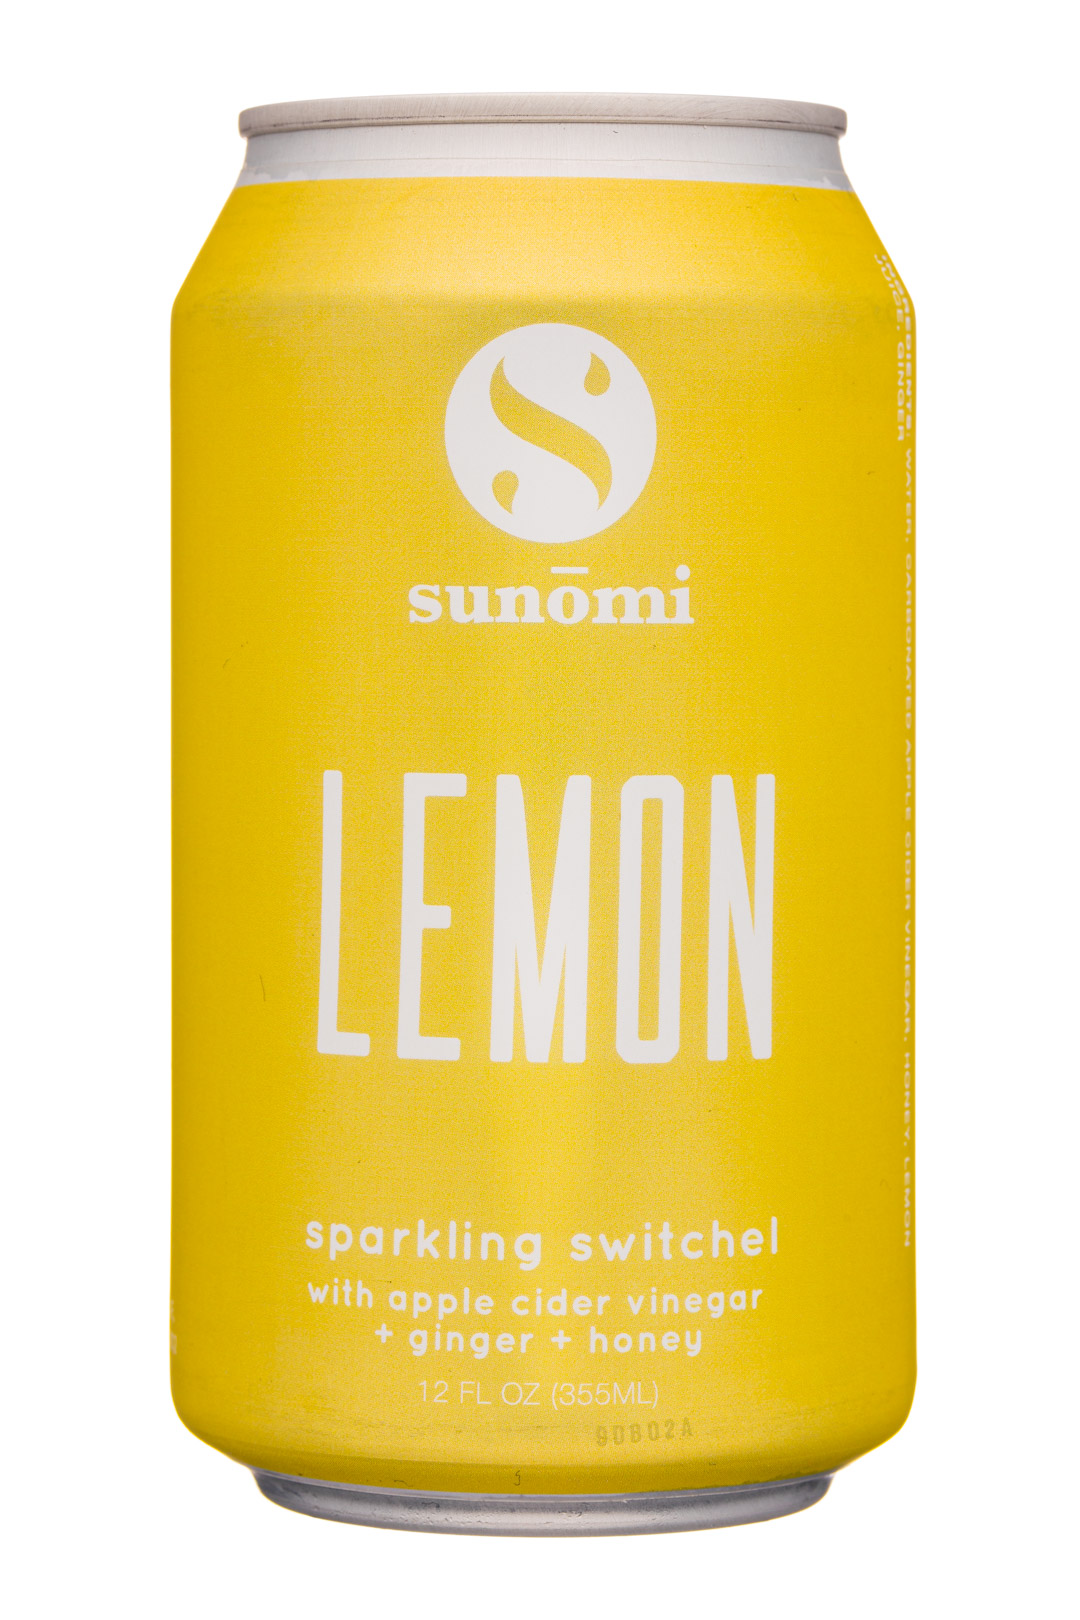 Sunomi: SipCity-12oz-Sunomi-SparklingSwitchel-Lemon-Front